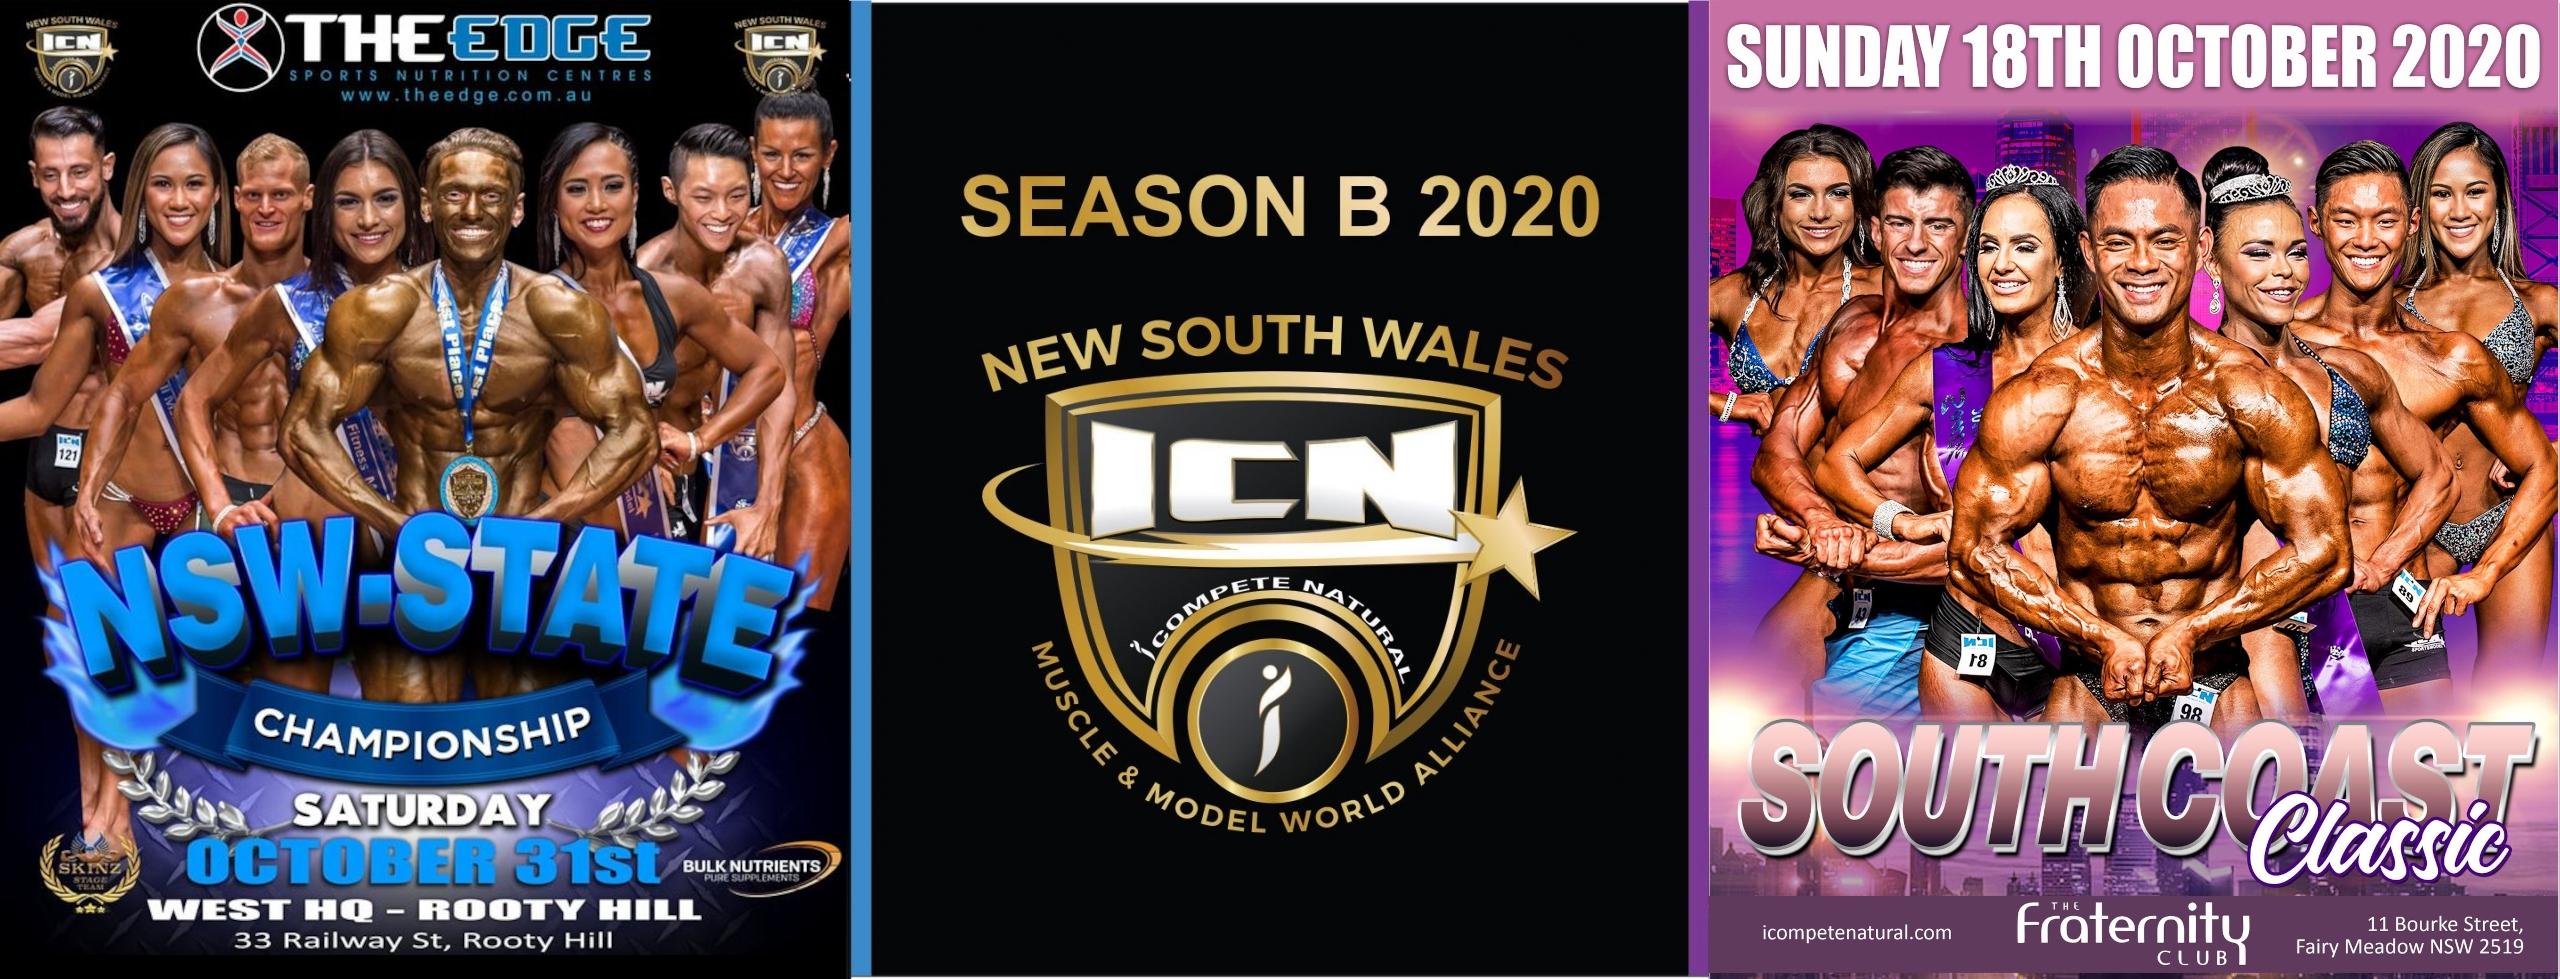 ICN NSW 2020